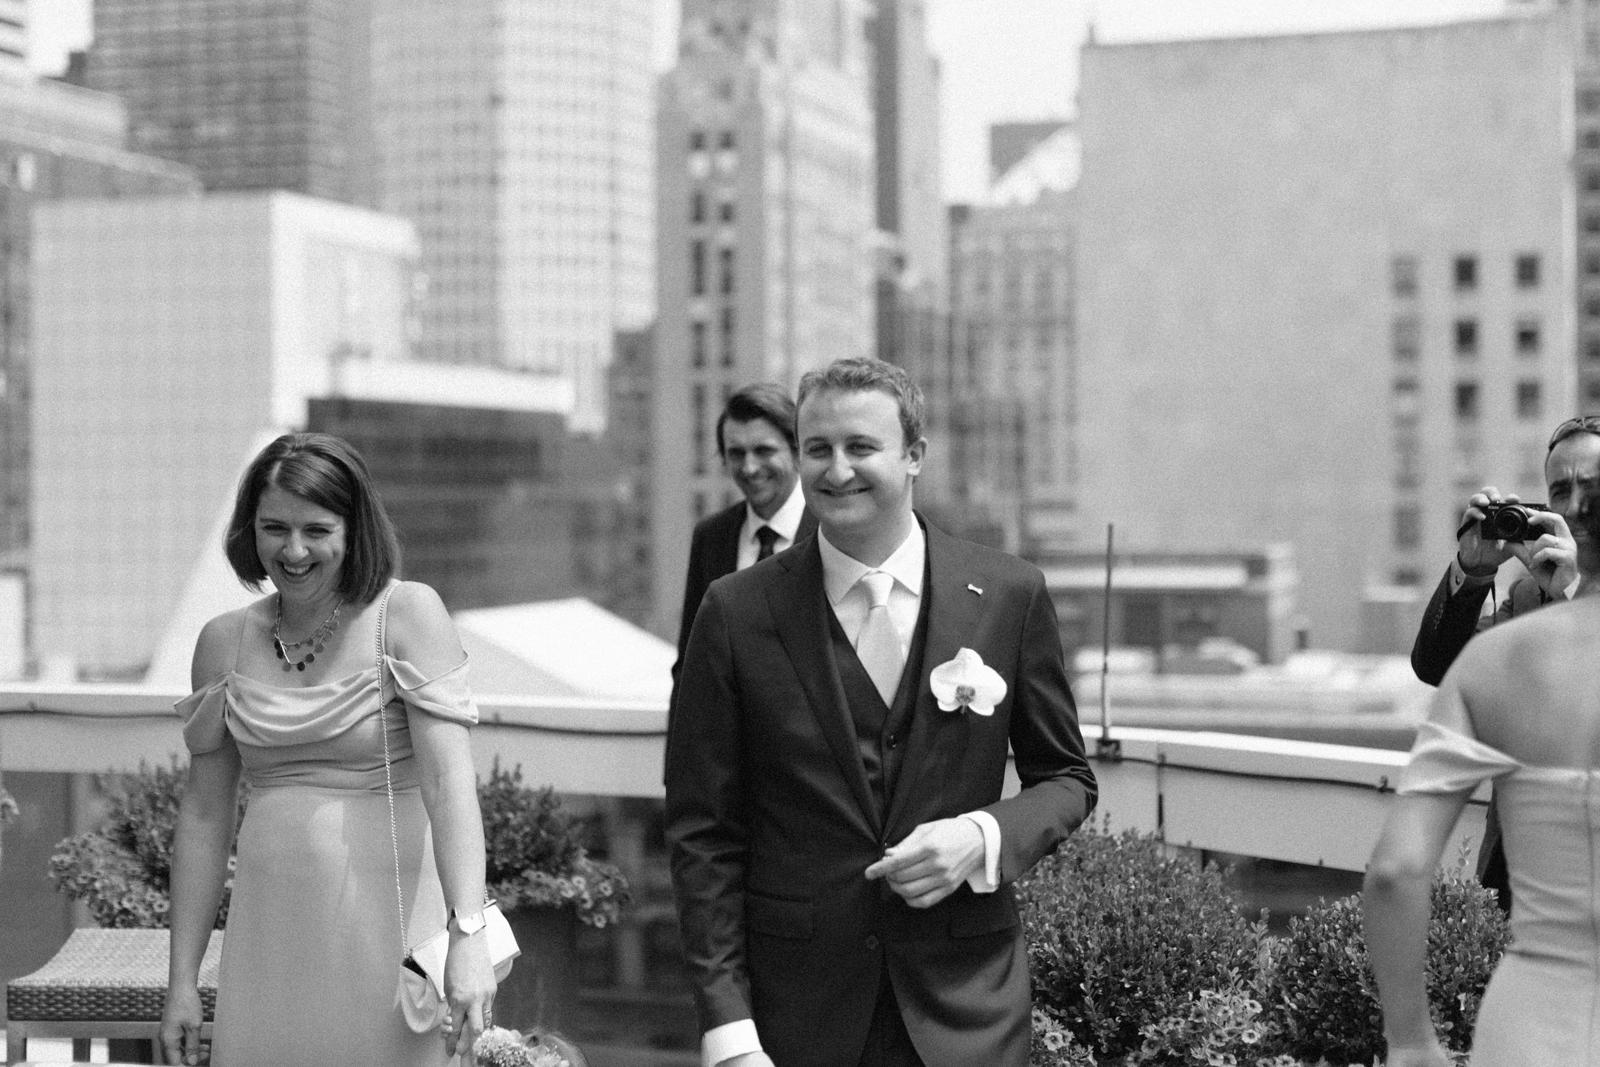 NYC Wedding Photography Sofitel Central Park Brooklyn Photographer Boris Zaretsky _B2C1964.jpg